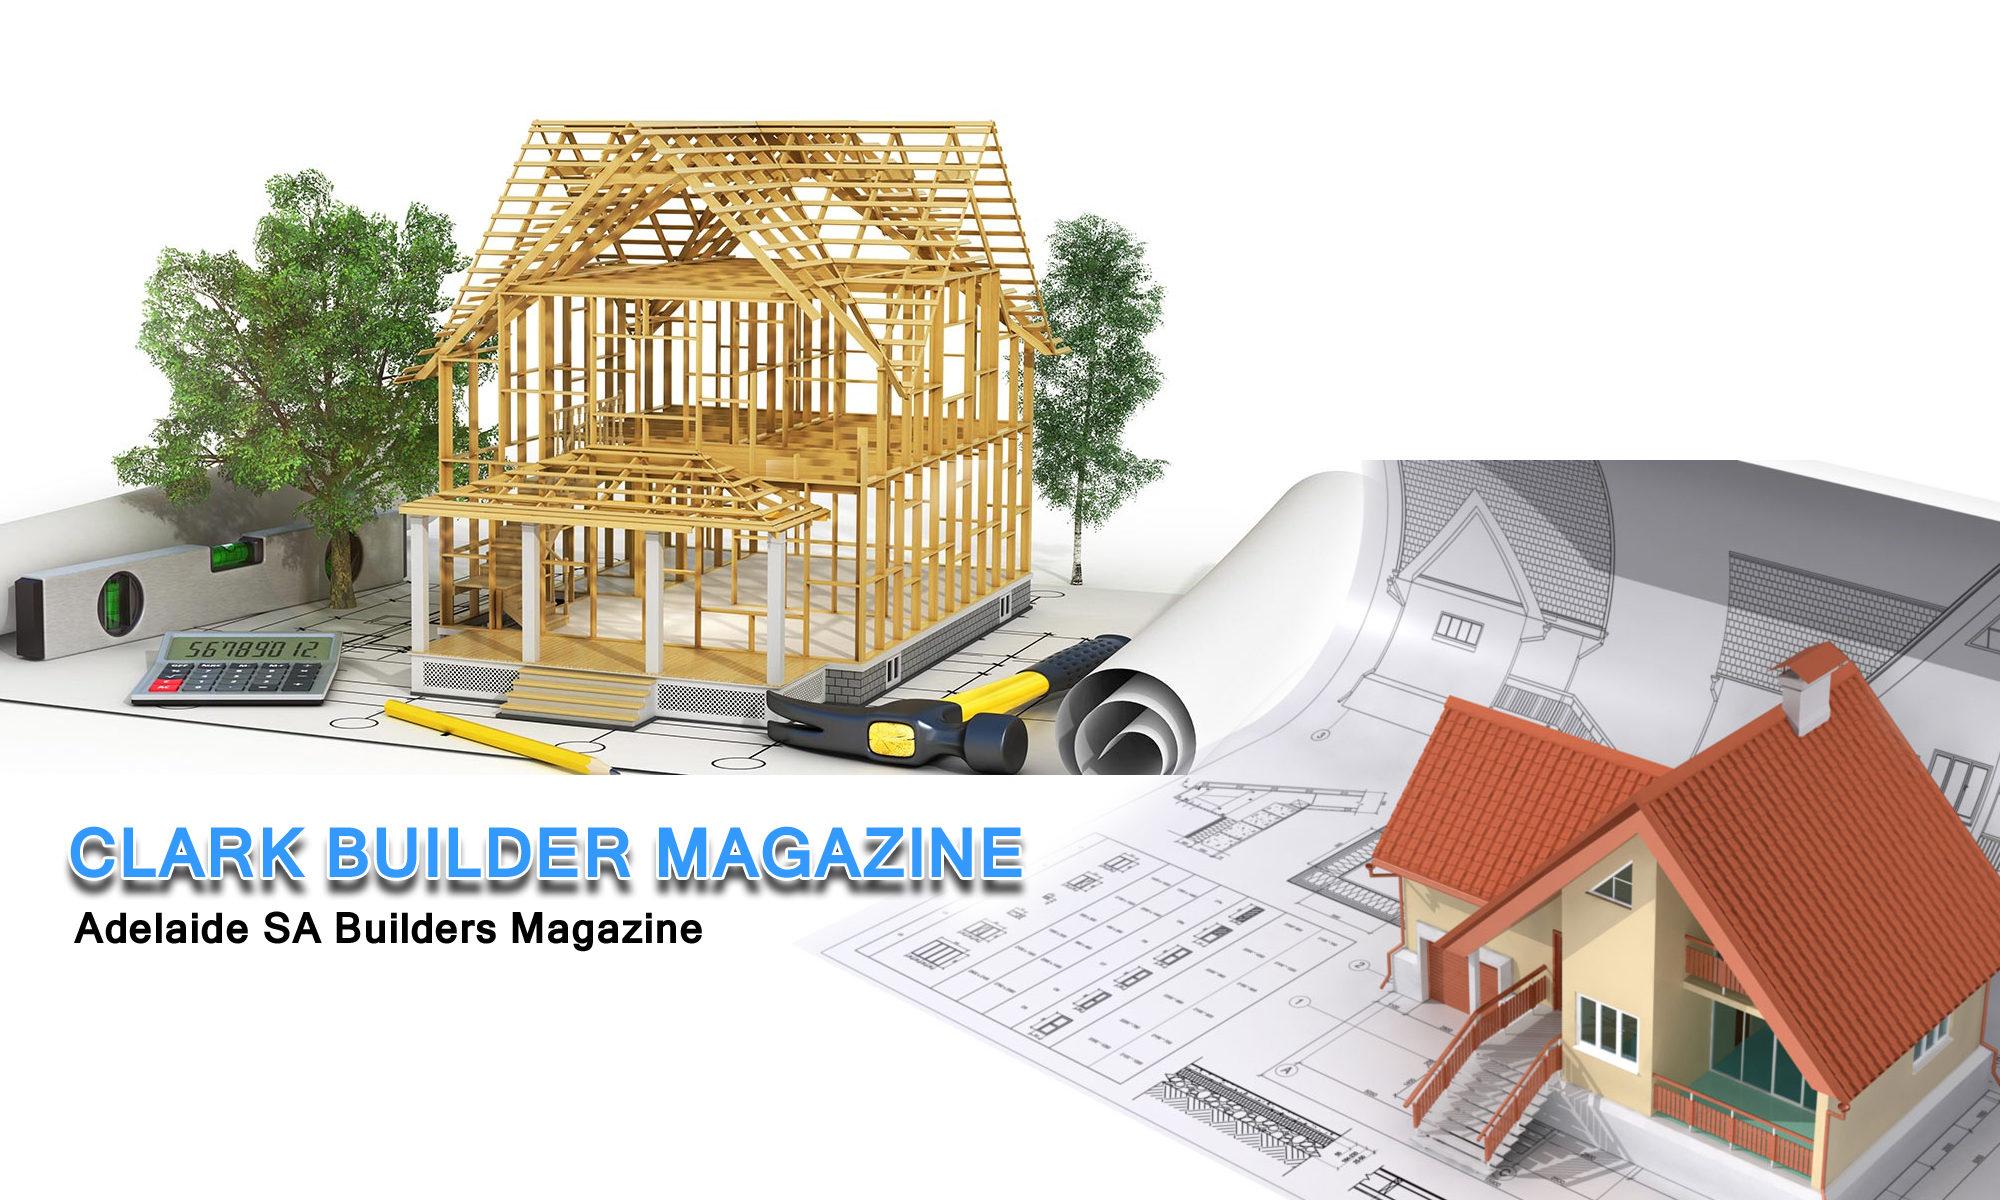 Clark Builder Magazine